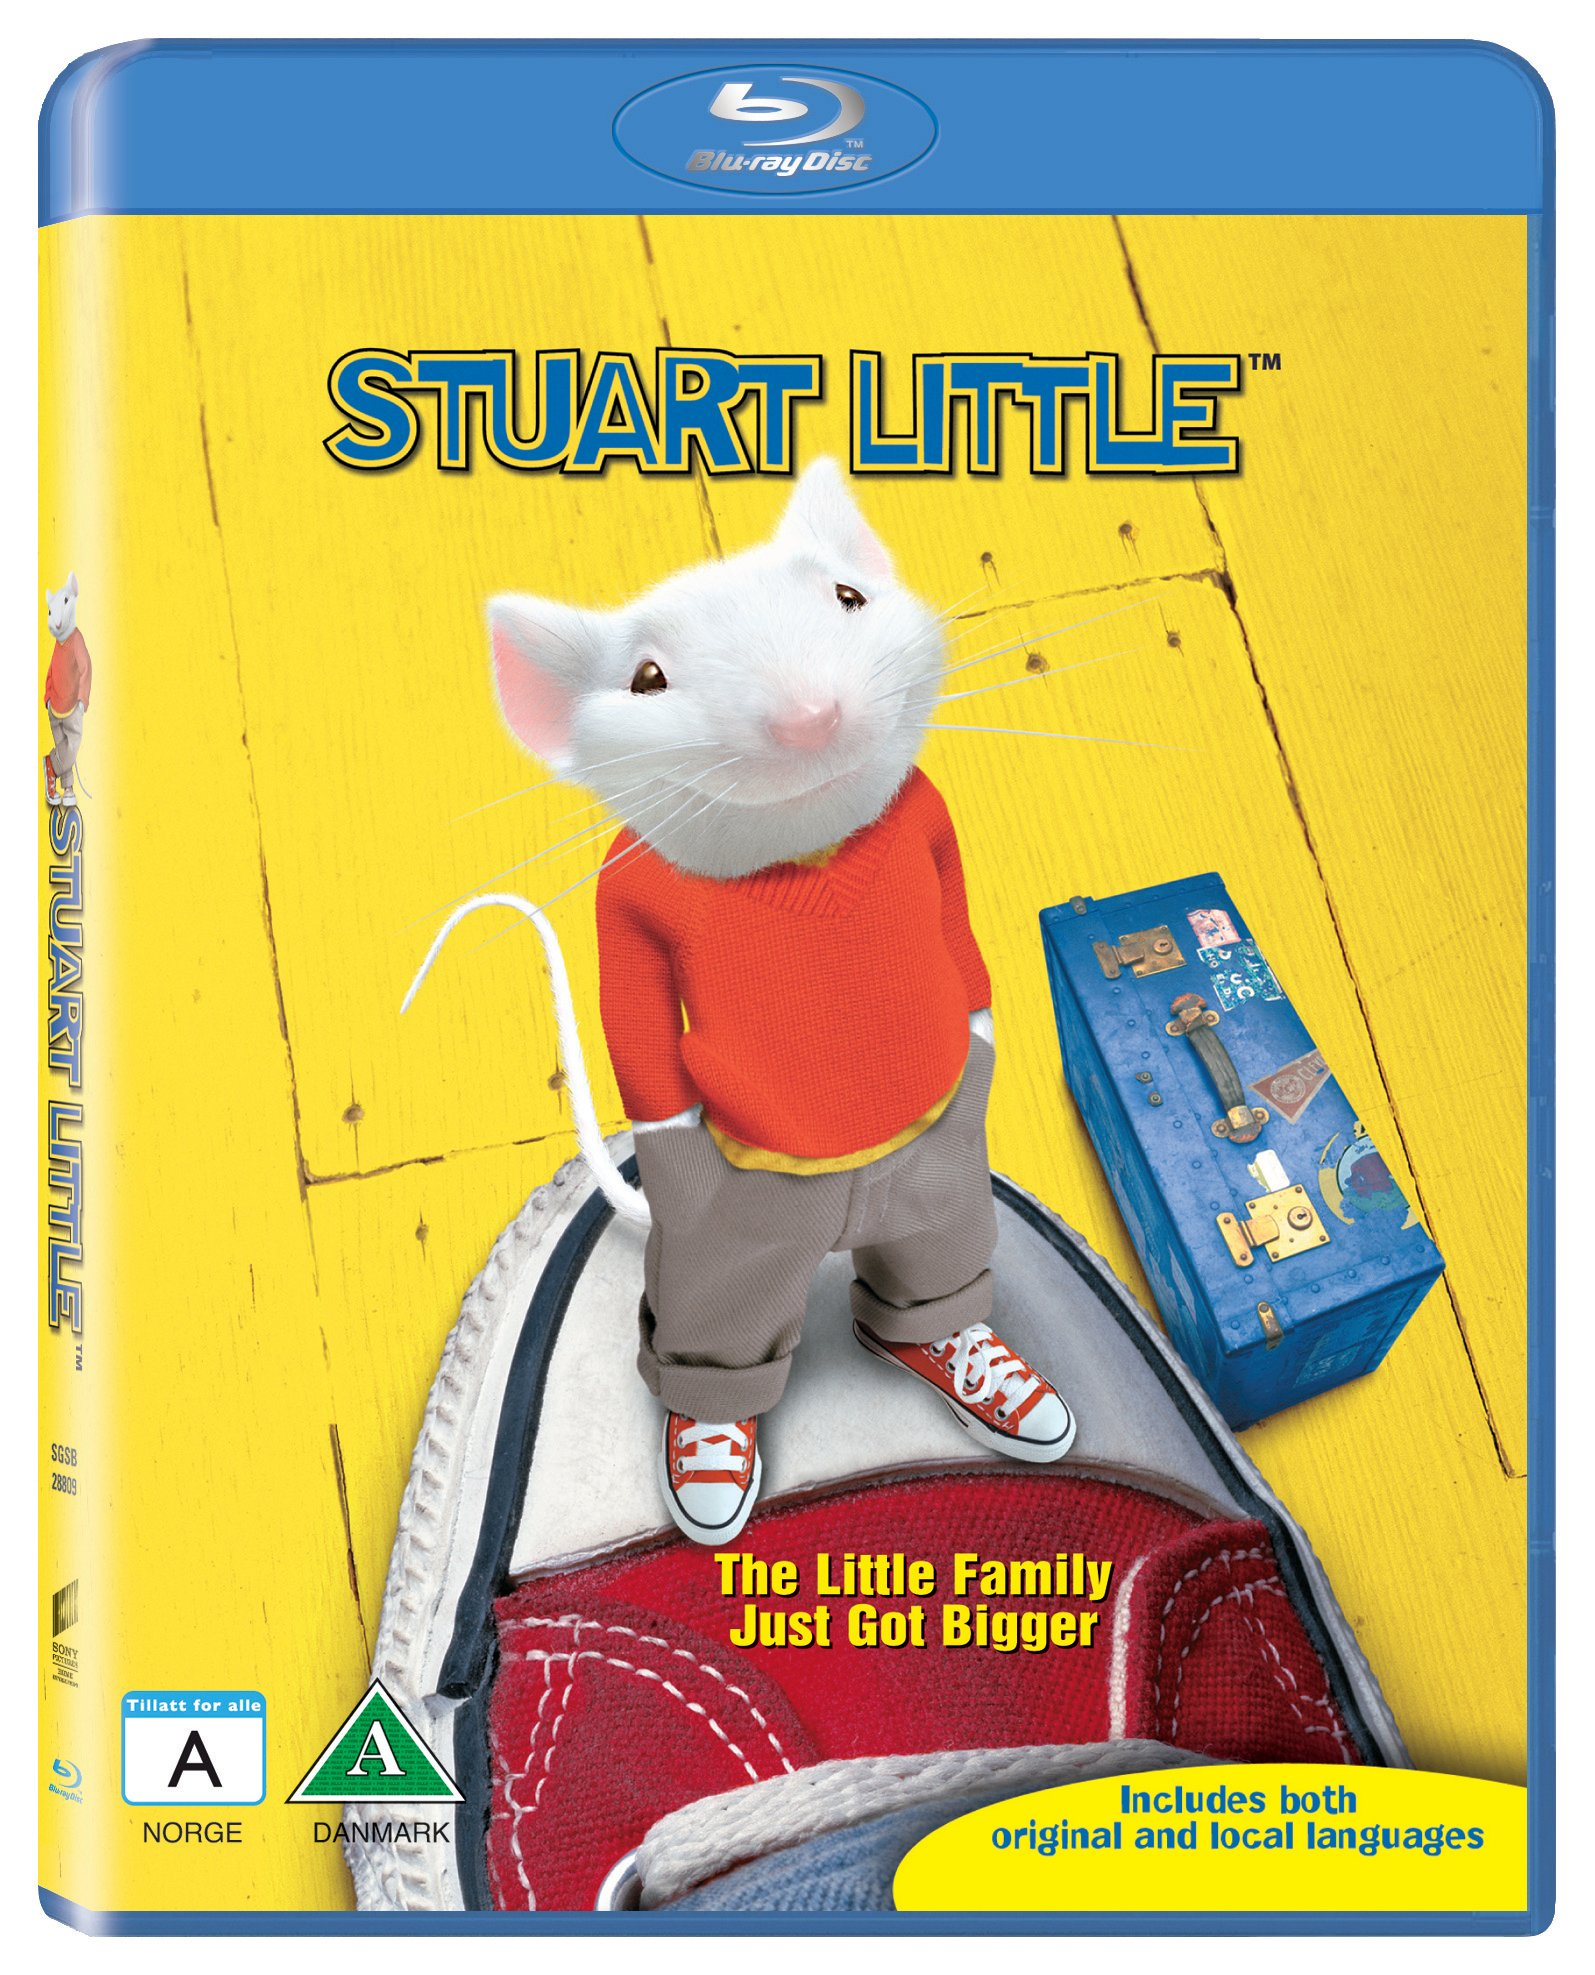 Stuart Little 1 - Blu Ray